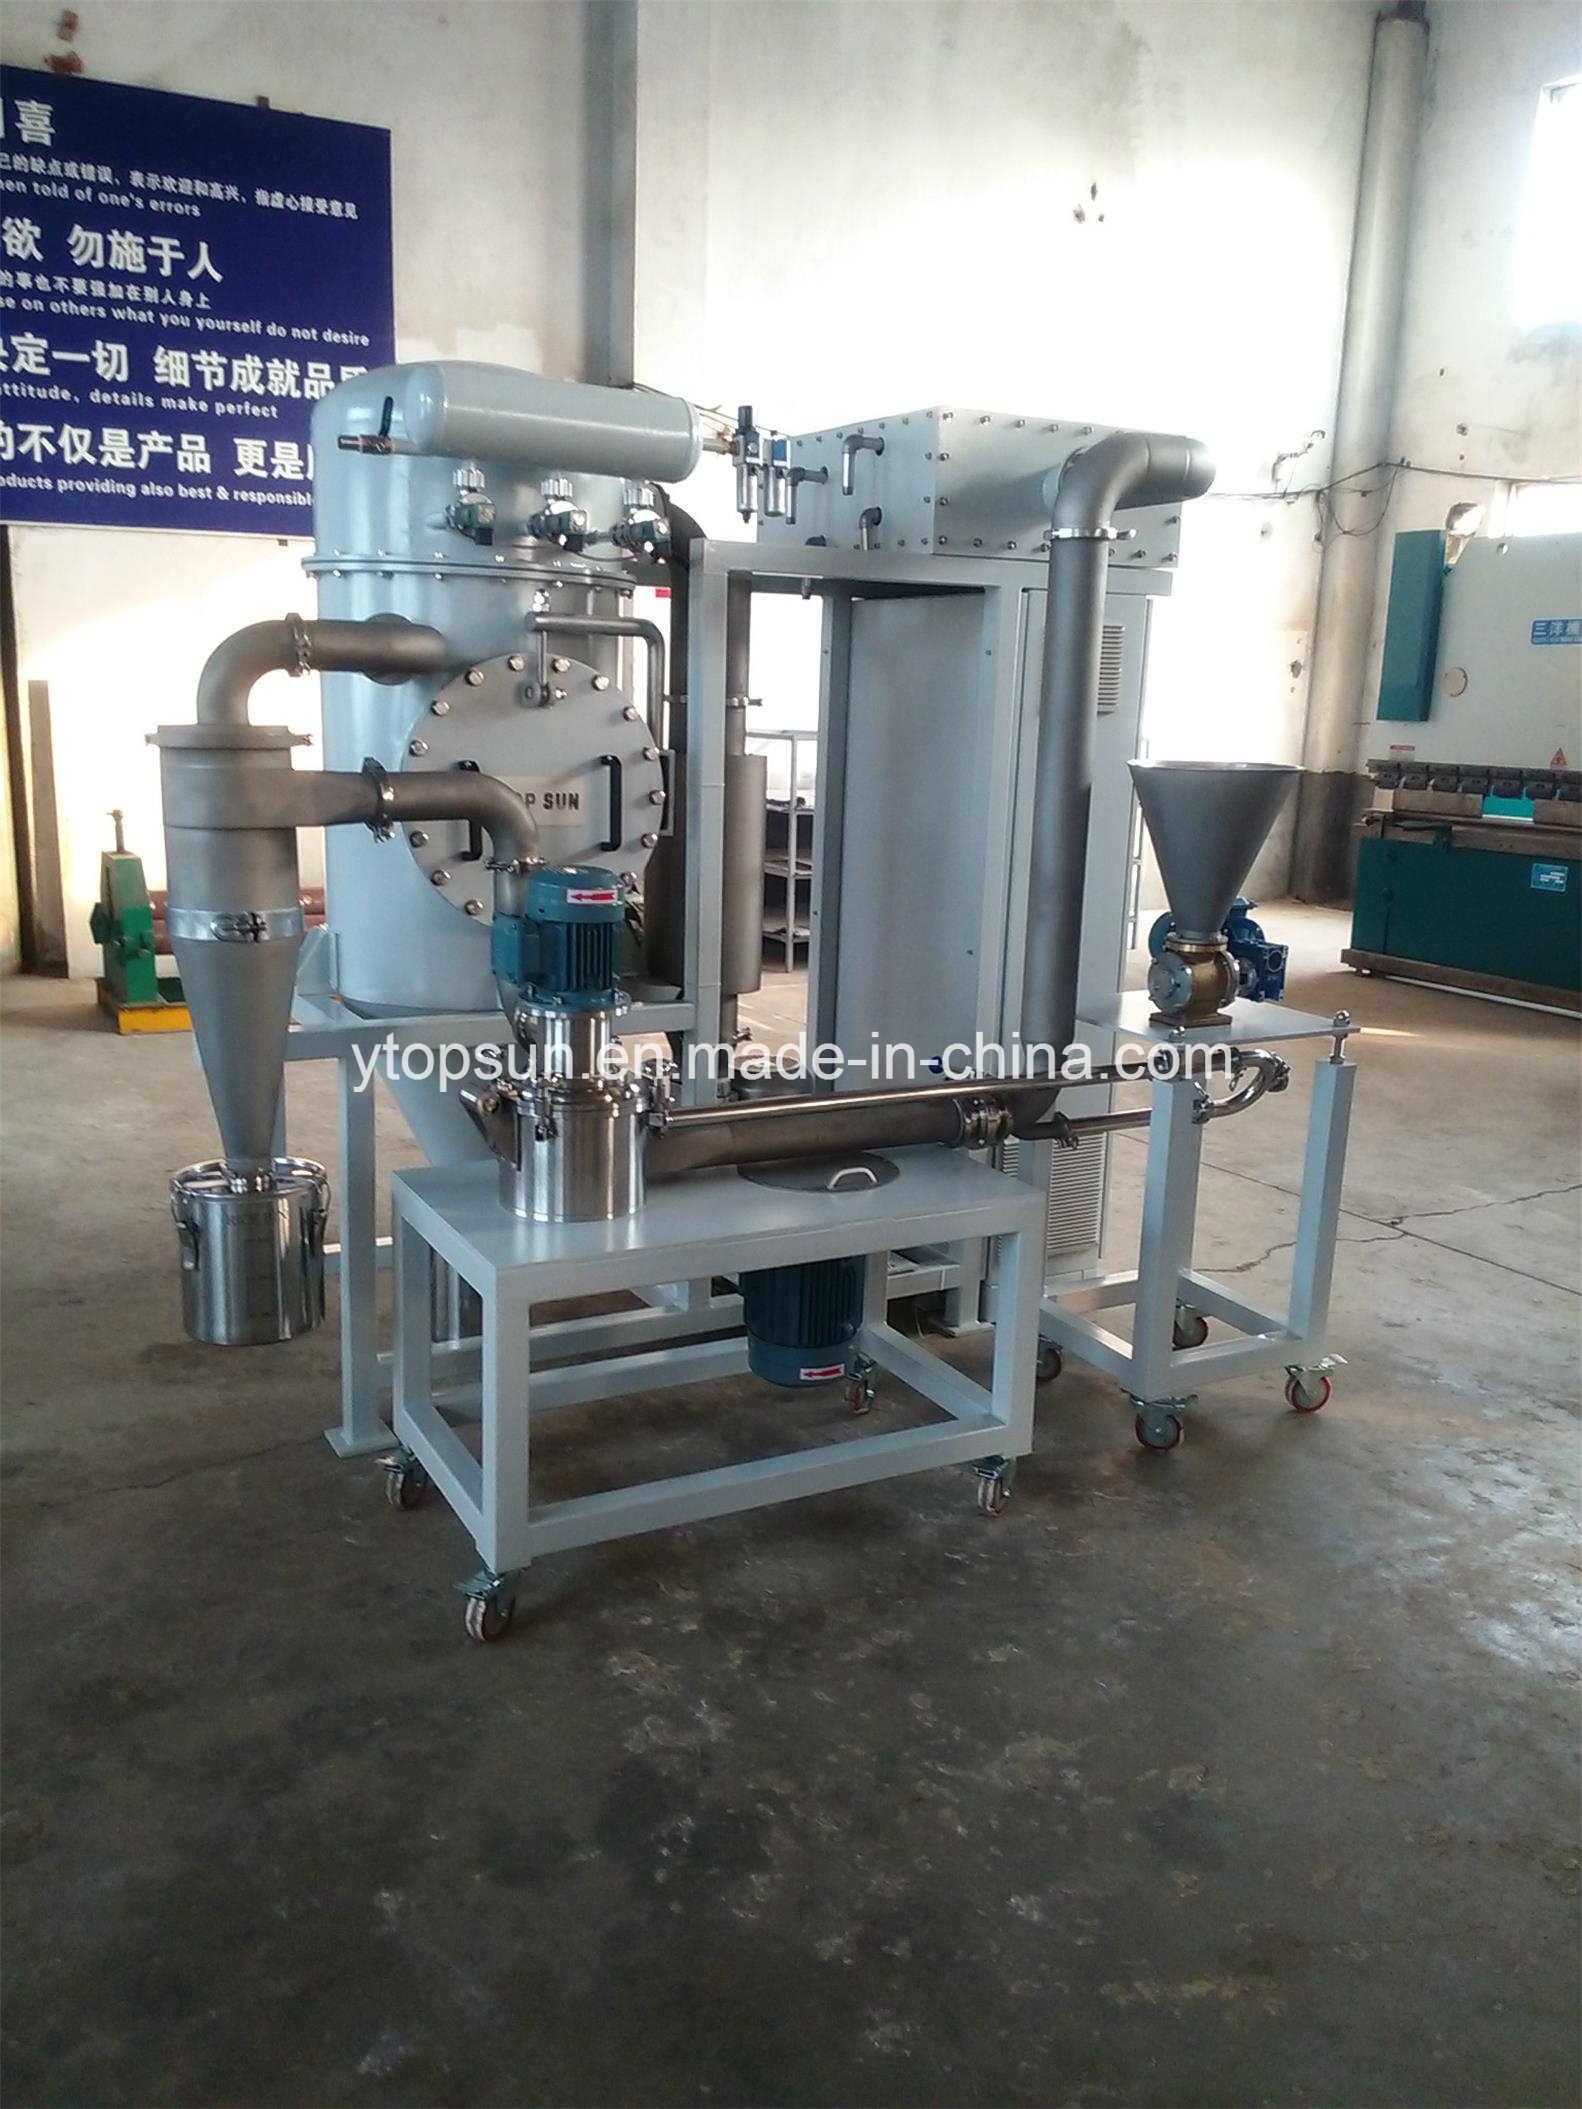 Powder Coating Equipment/Small Volume Grinding Mill